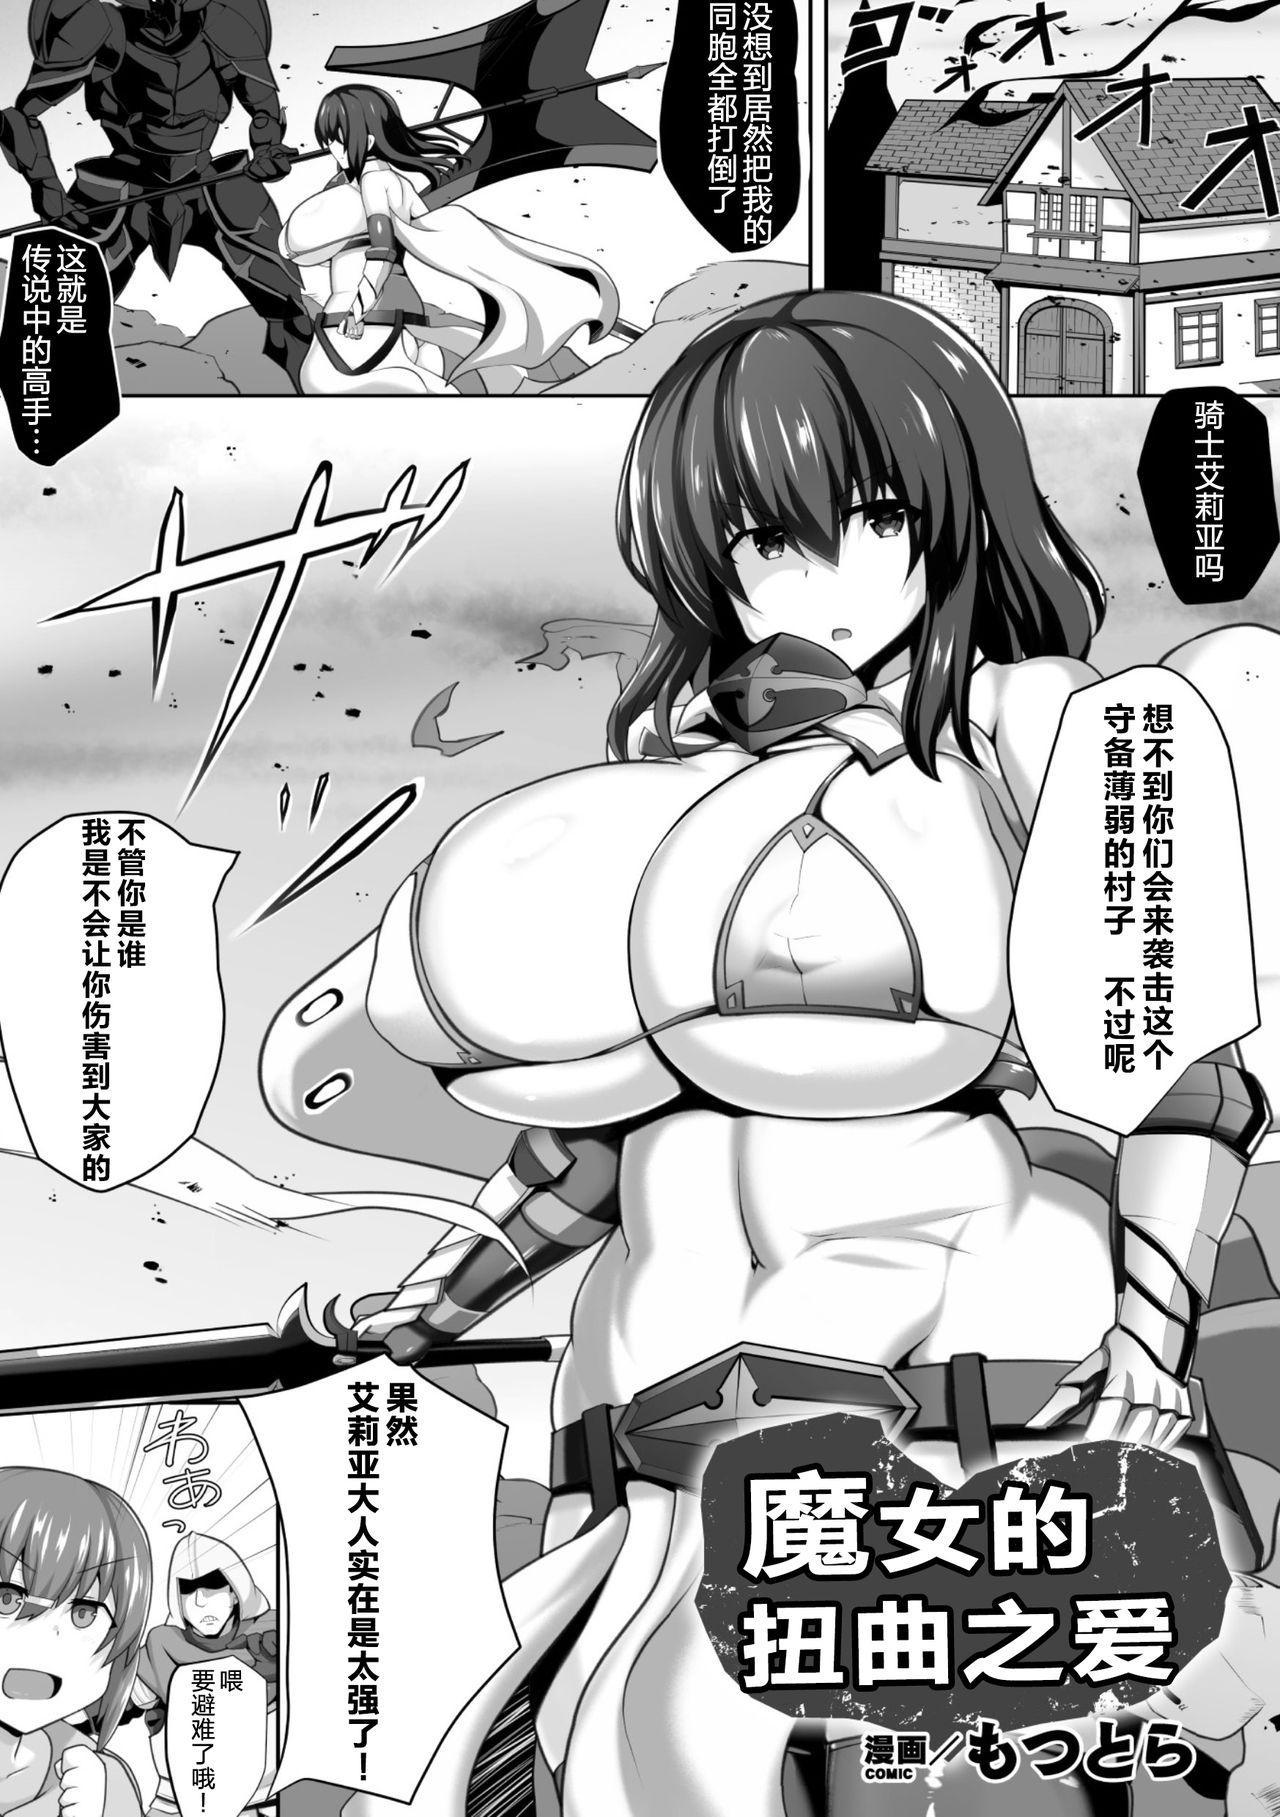 2D Comic Magazine Futanarikko no Tanetsuke Press de Kyousei Haramase! Vol. 2 39